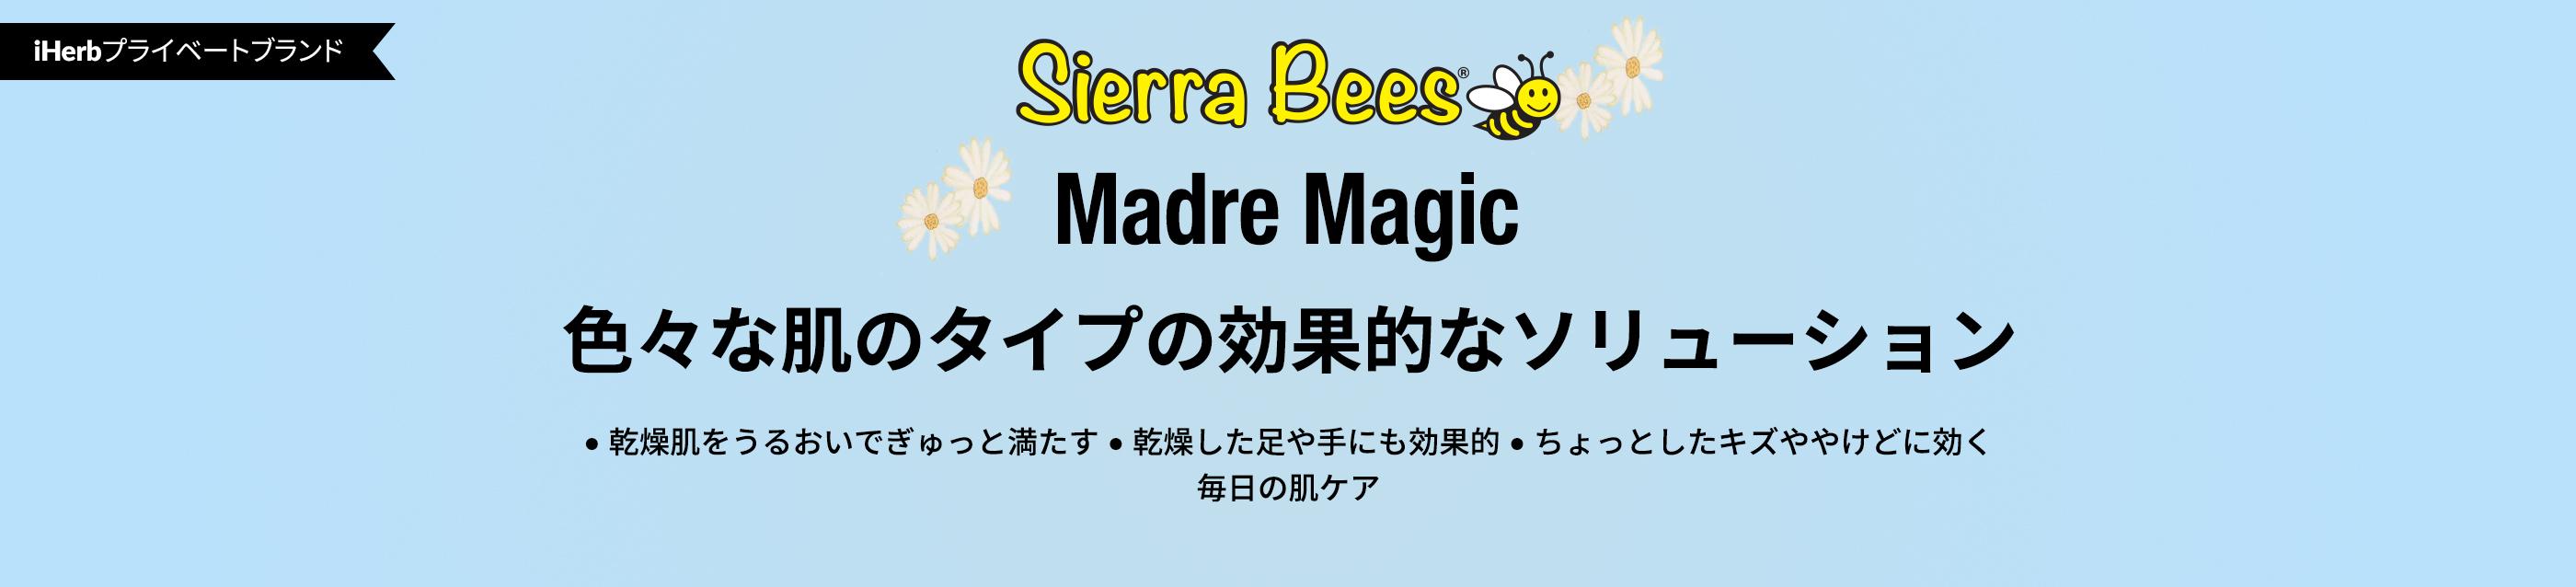 Sierra Bees Madre Magic